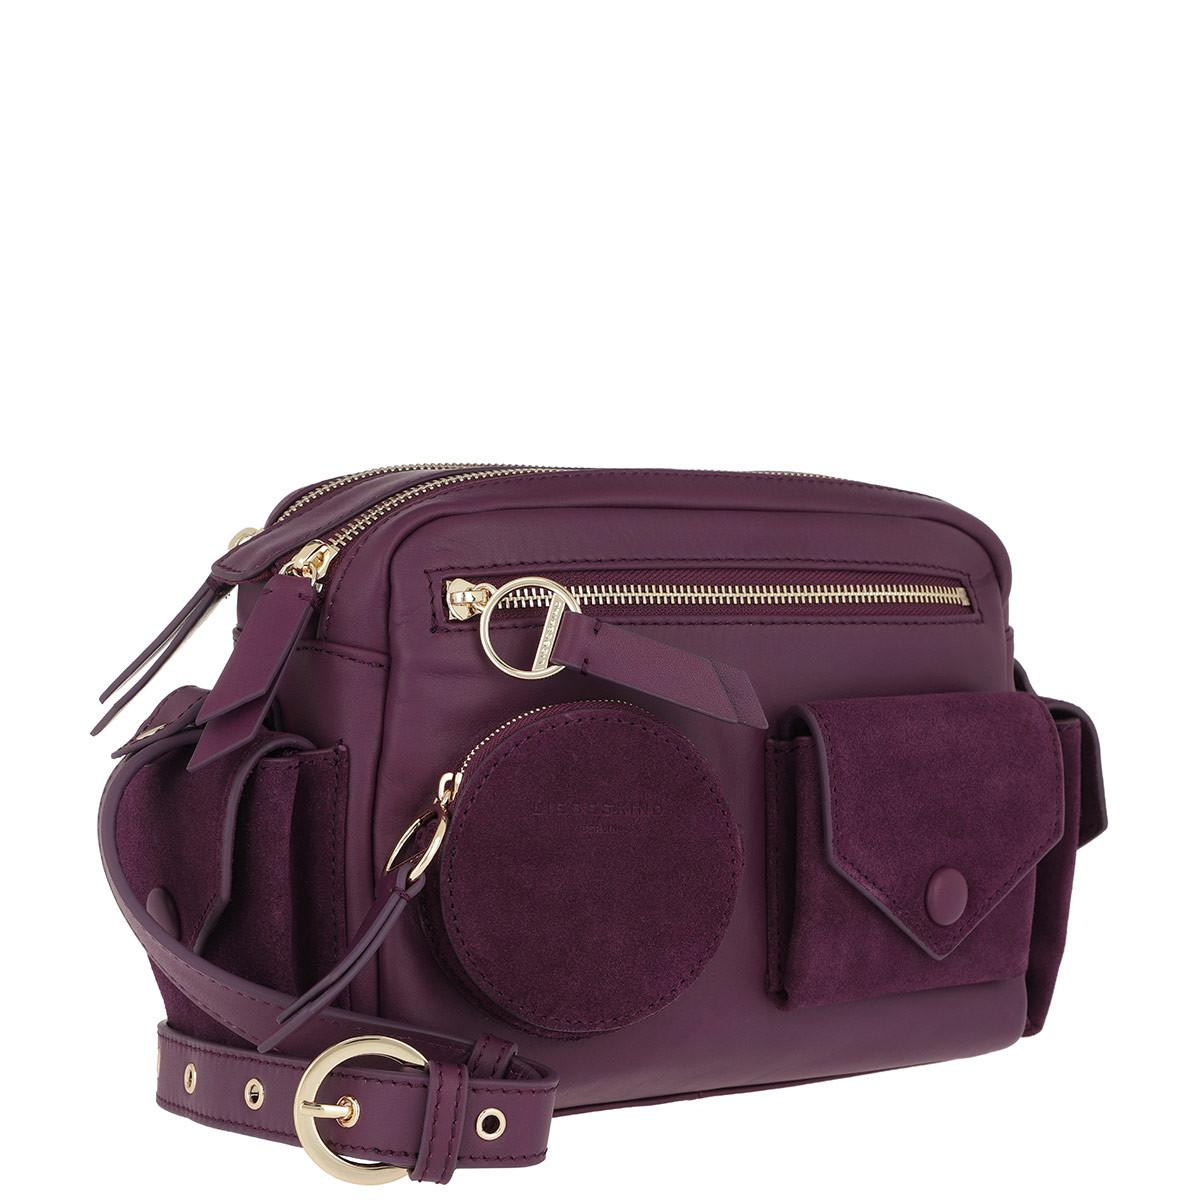 Liebeskind Berlin Leather Casual Pocket Camera Bag Medium